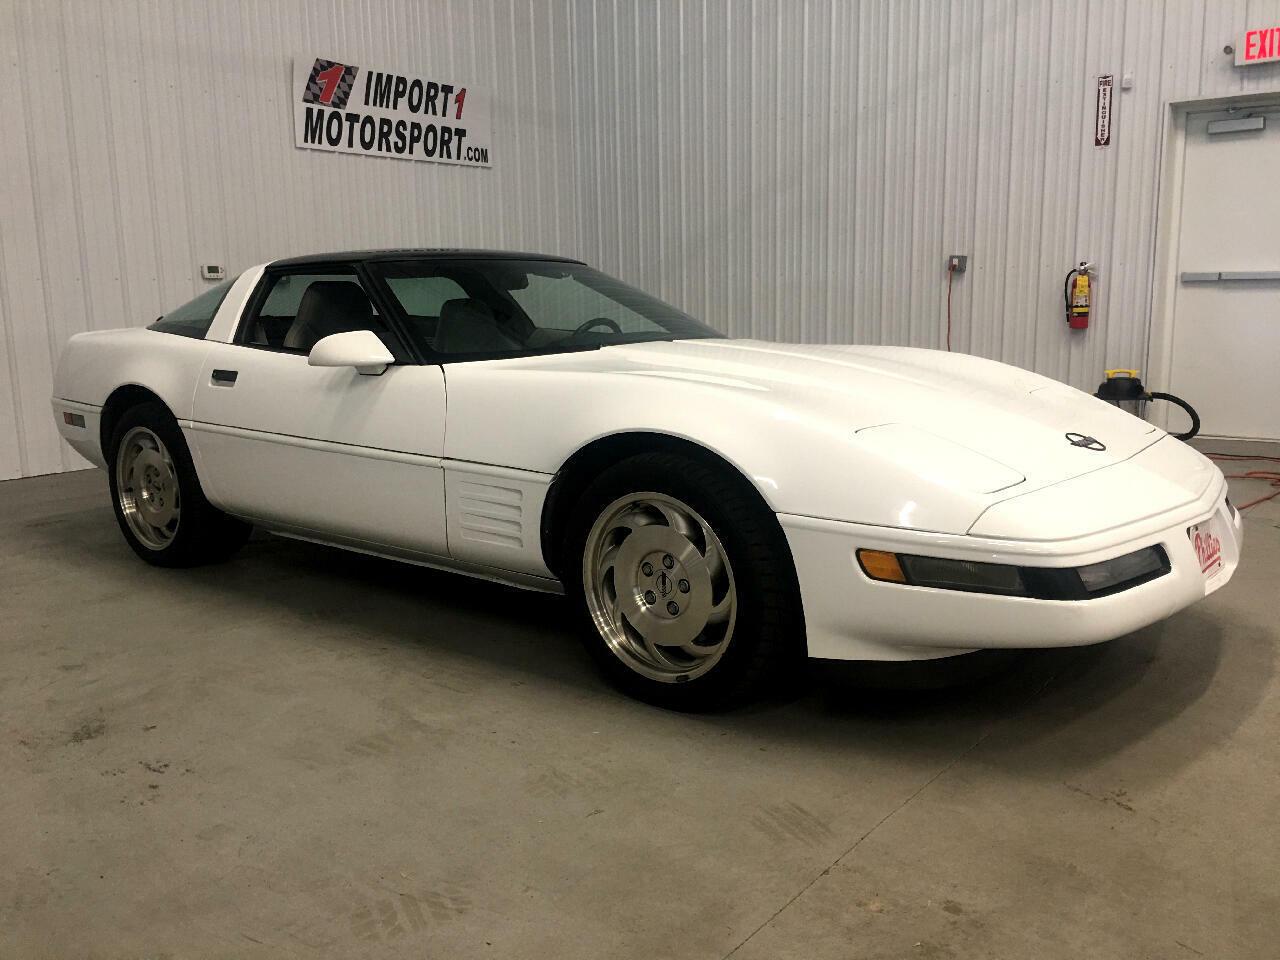 1994 White Chevrolet Corvette Coupe    C4 Corvette Photo 3